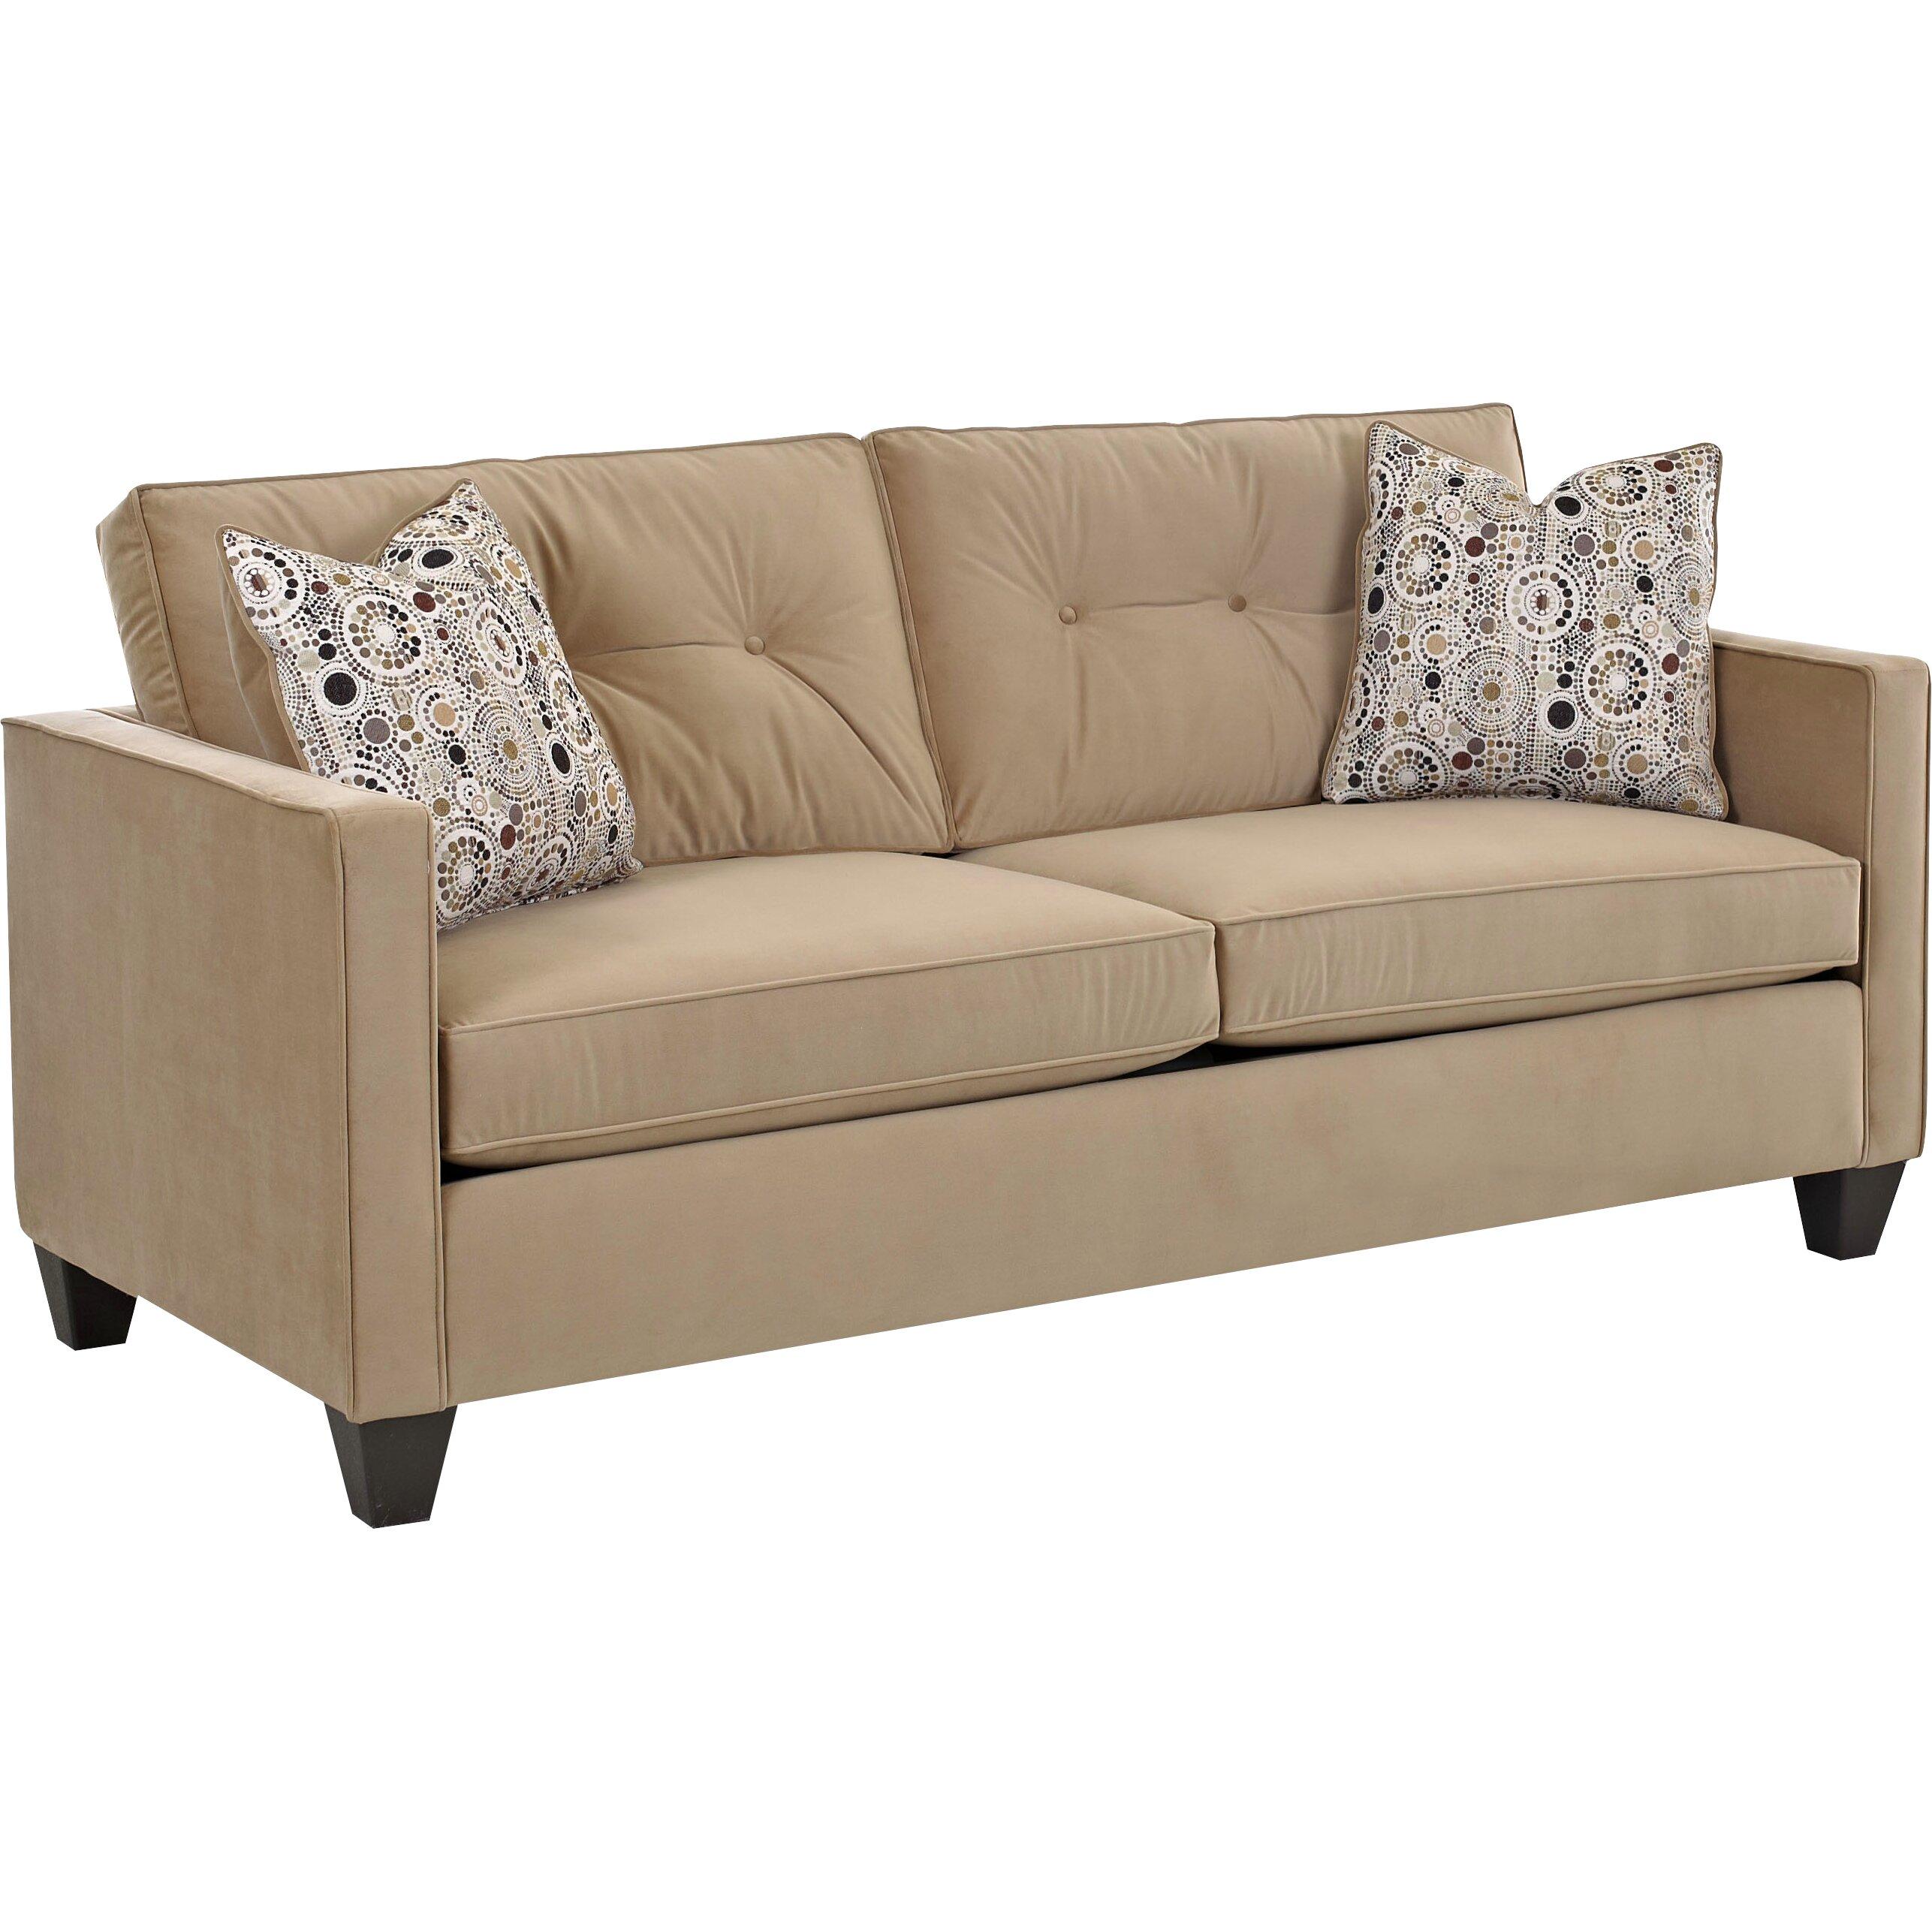 Klaussner Bedroom Furniture Klaussner Furniture Derry Sofa Reviews Wayfair